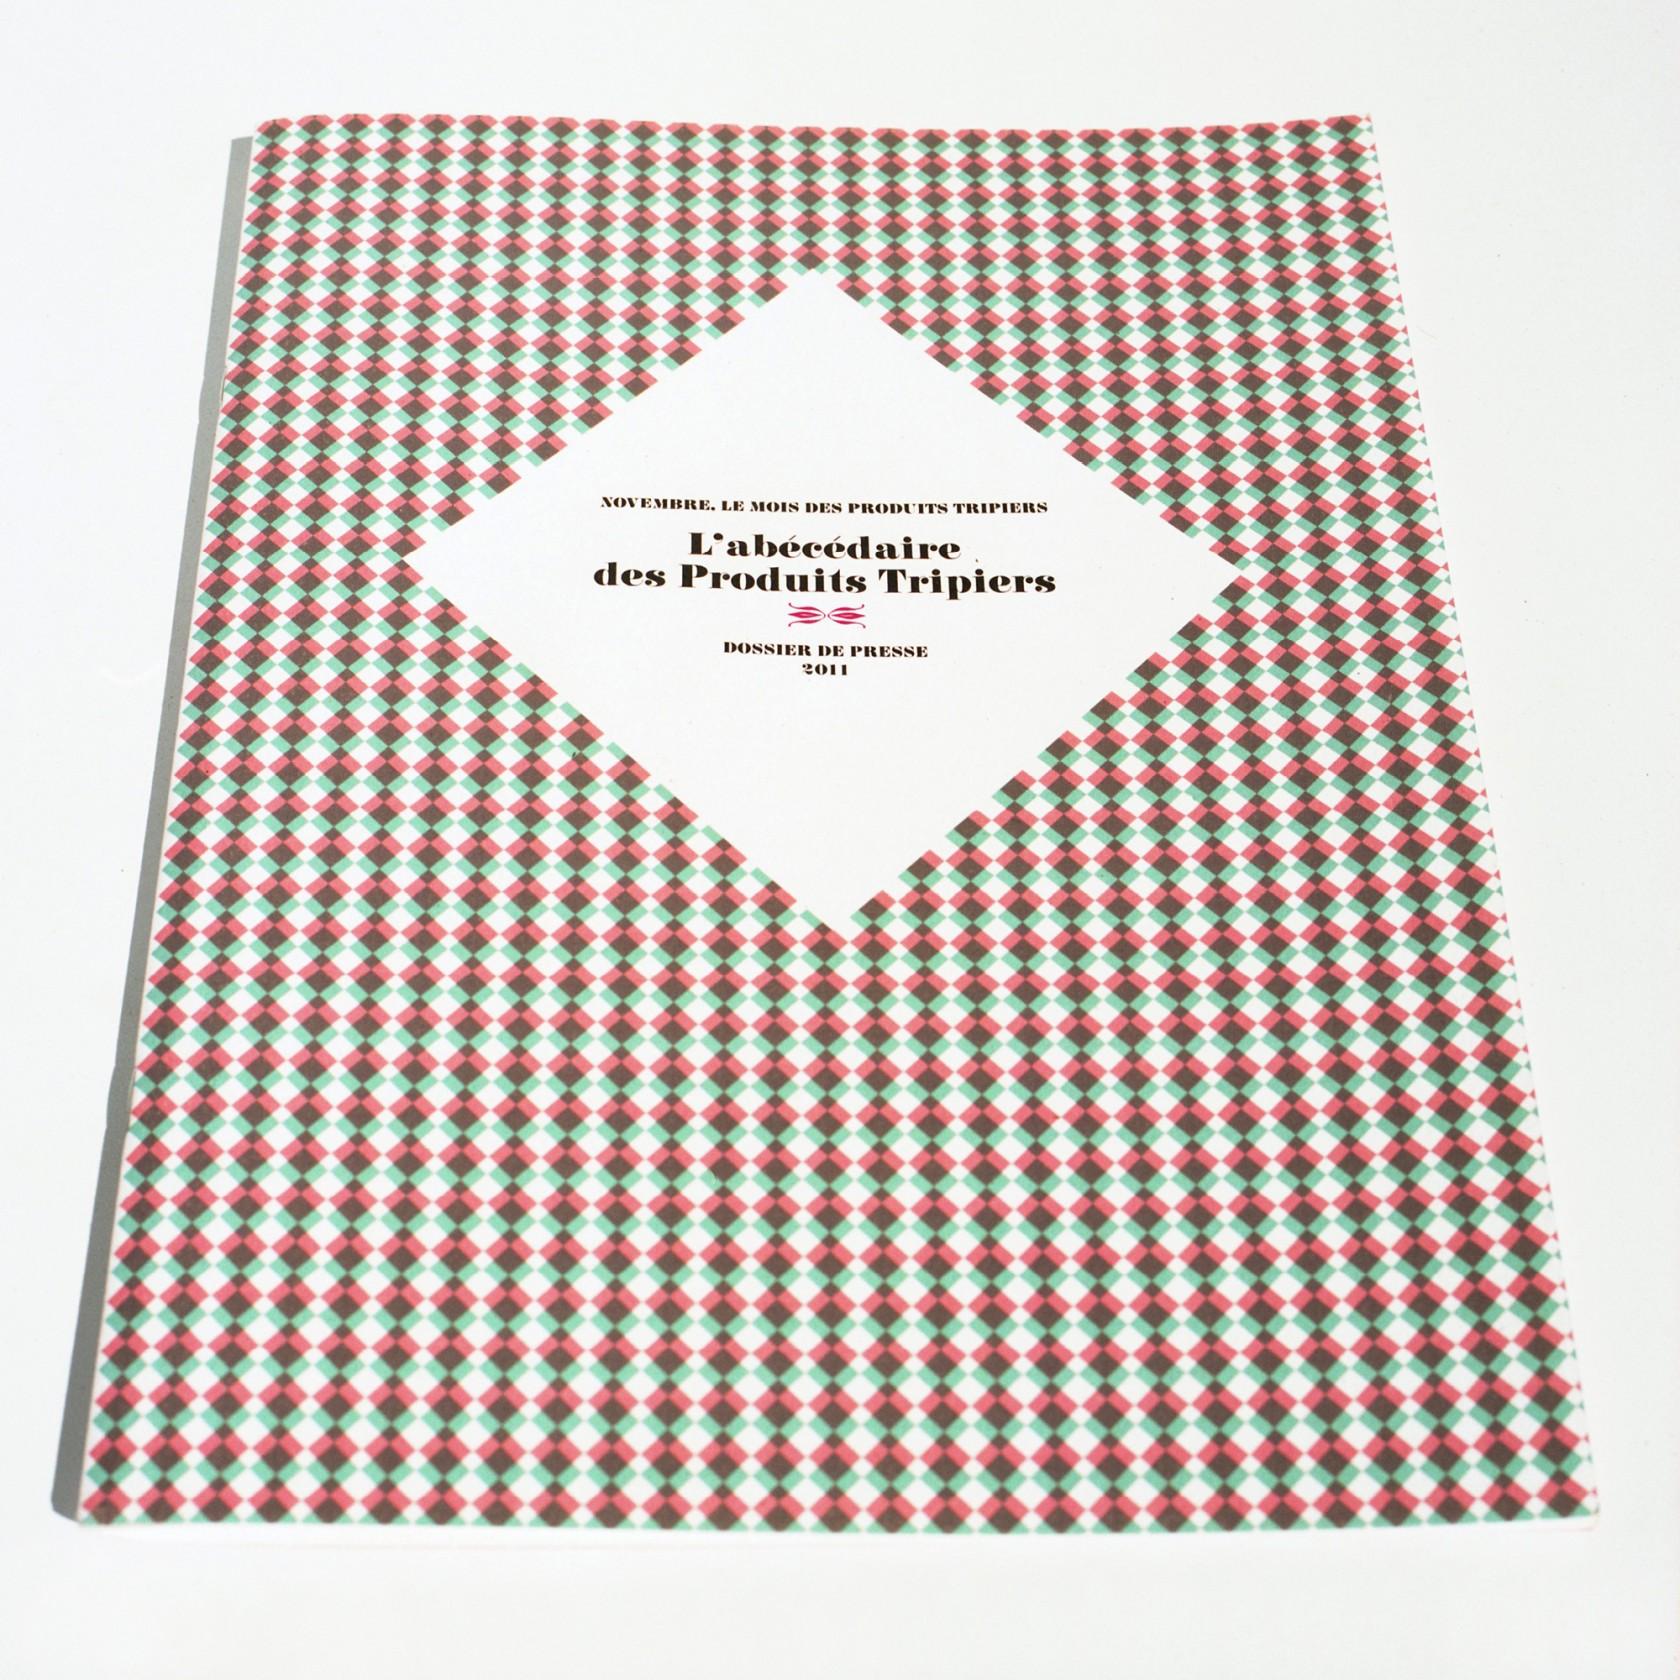 fouinzanardi -  fz_print_rp_com_produitstripiers8